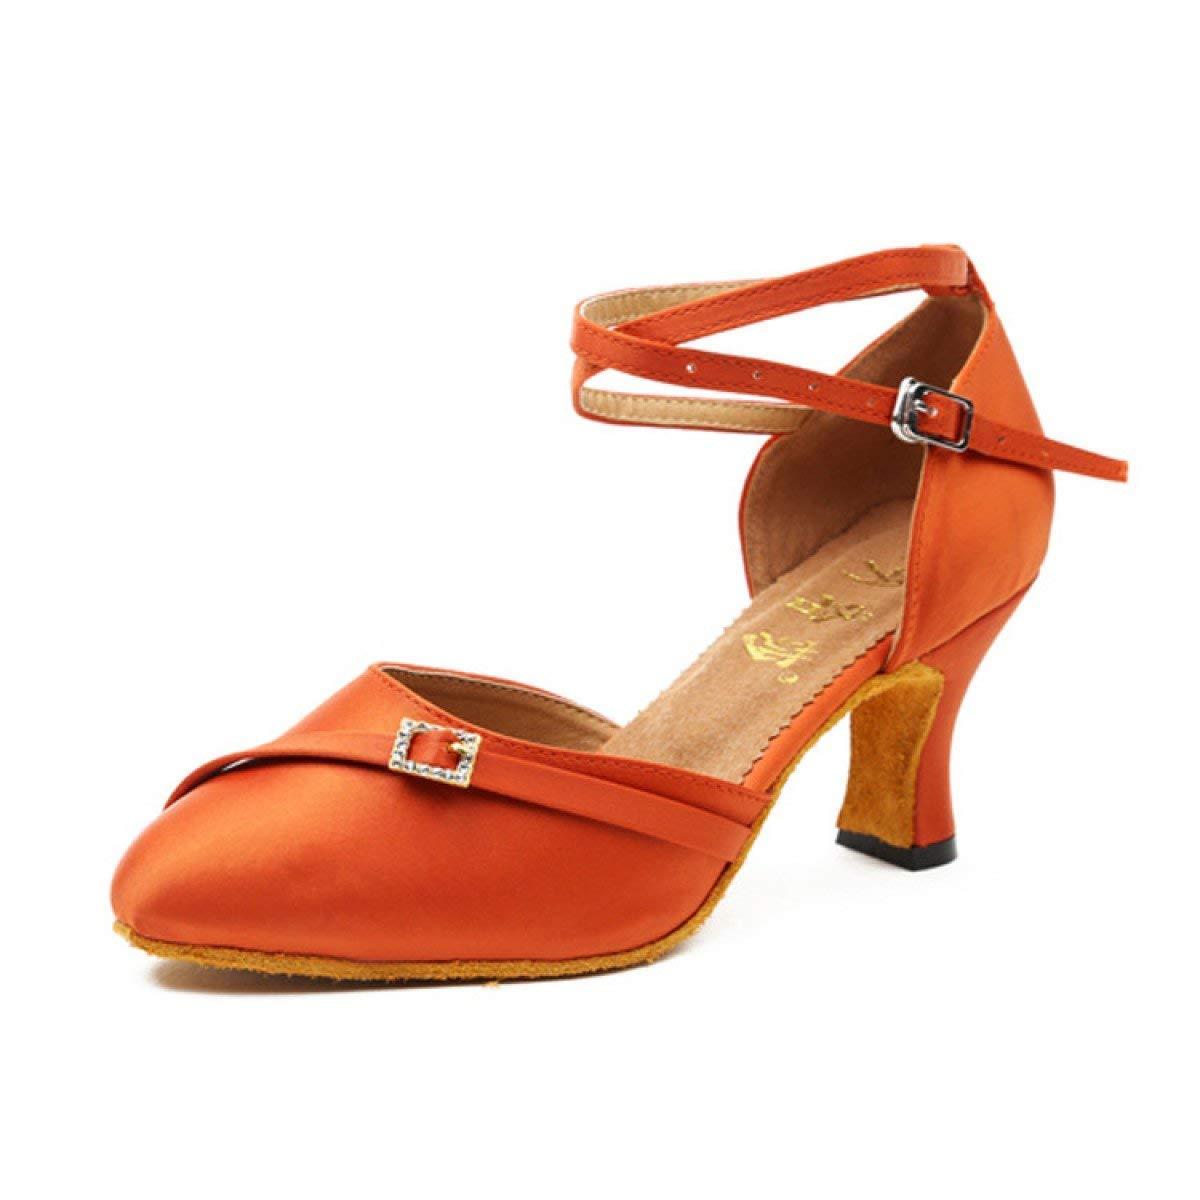 Willsego damen Latin Dance Closed Closed Closed Toe Hoher AbsatzSalsa Tango Chacha Samba Modern Jazz Schuhe Sandalen Orangeheeled6cm-UK4.5   EU36   Our37 (Farbe   Orangeheeled5cm Größe   UK3 EU33 Our34) 28e805